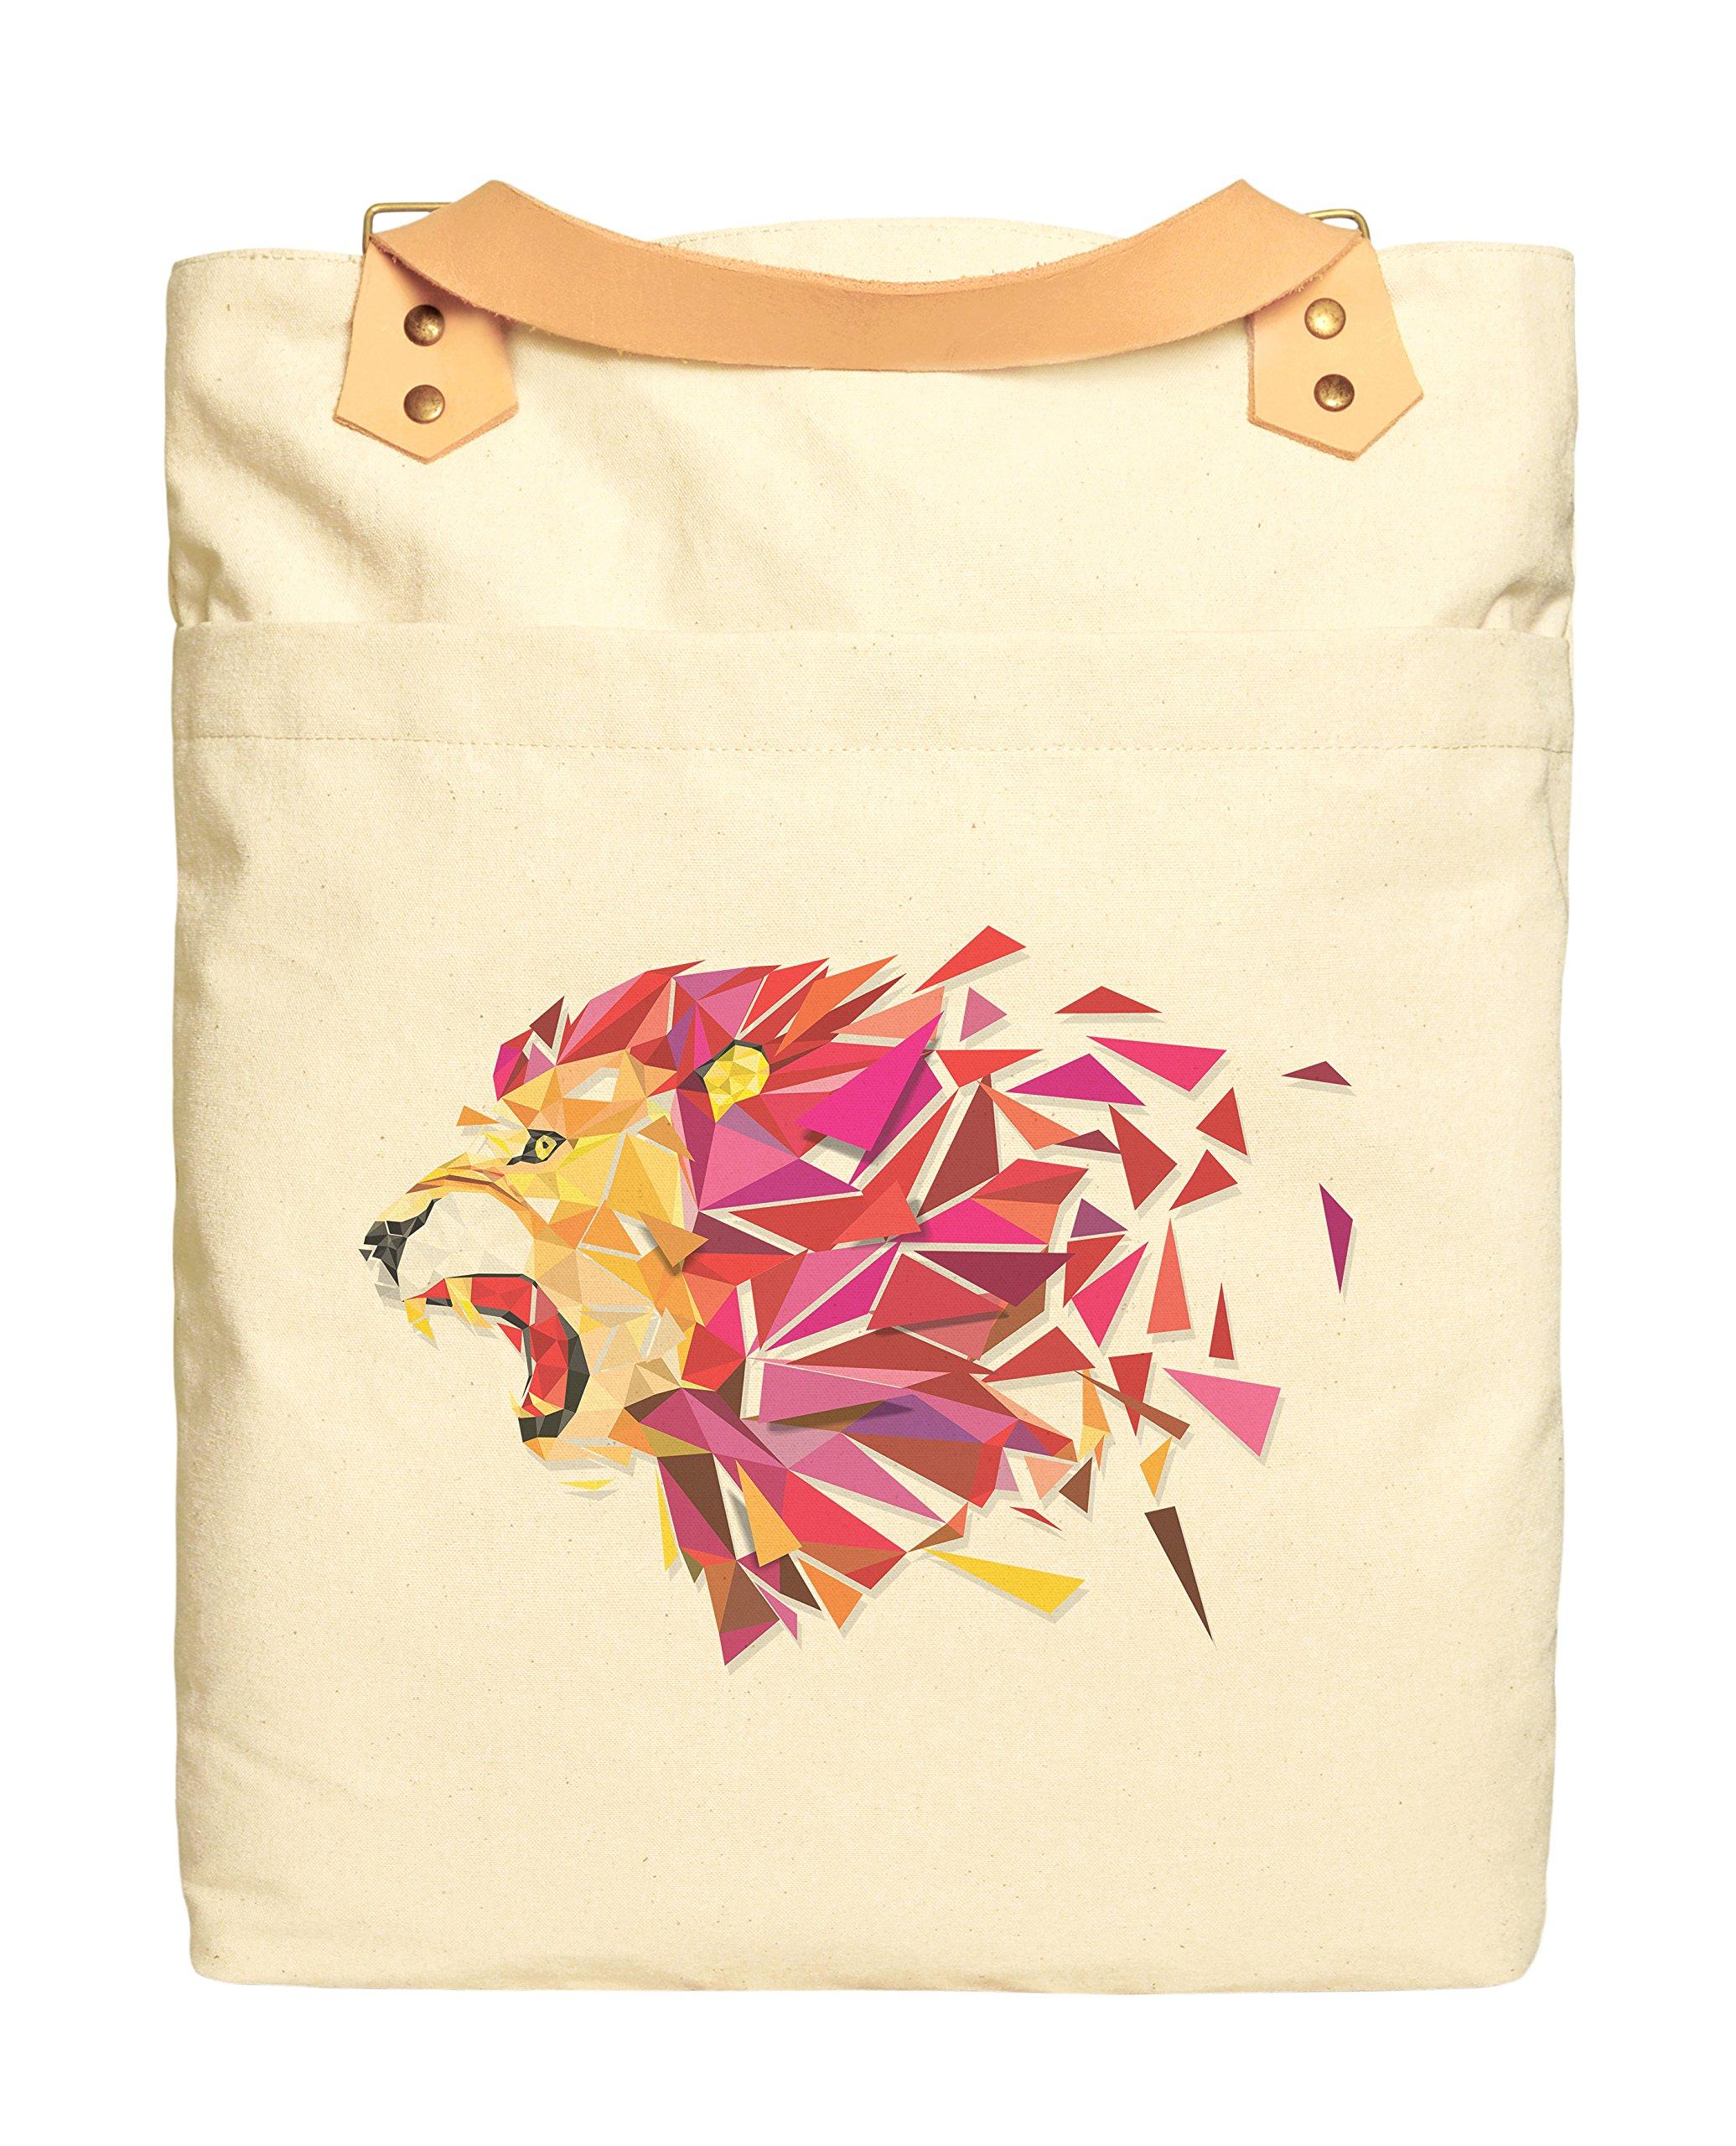 Unisex Polygon Lion Print Cotton Canvas Leather Straps Laptop Backpack WAS_34